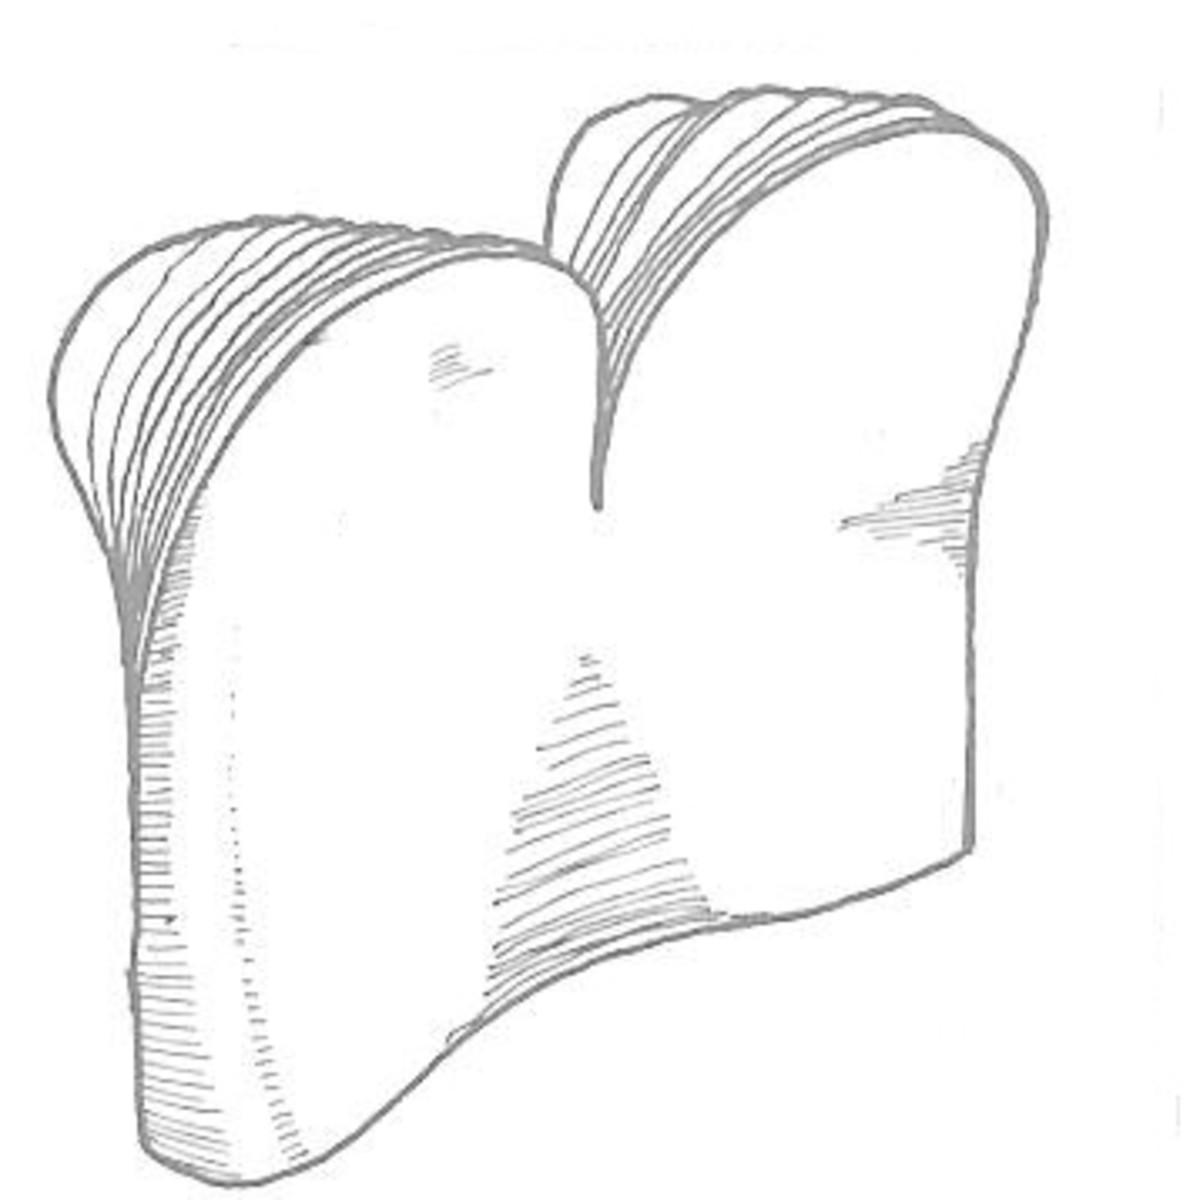 Cutting the Petal Shape